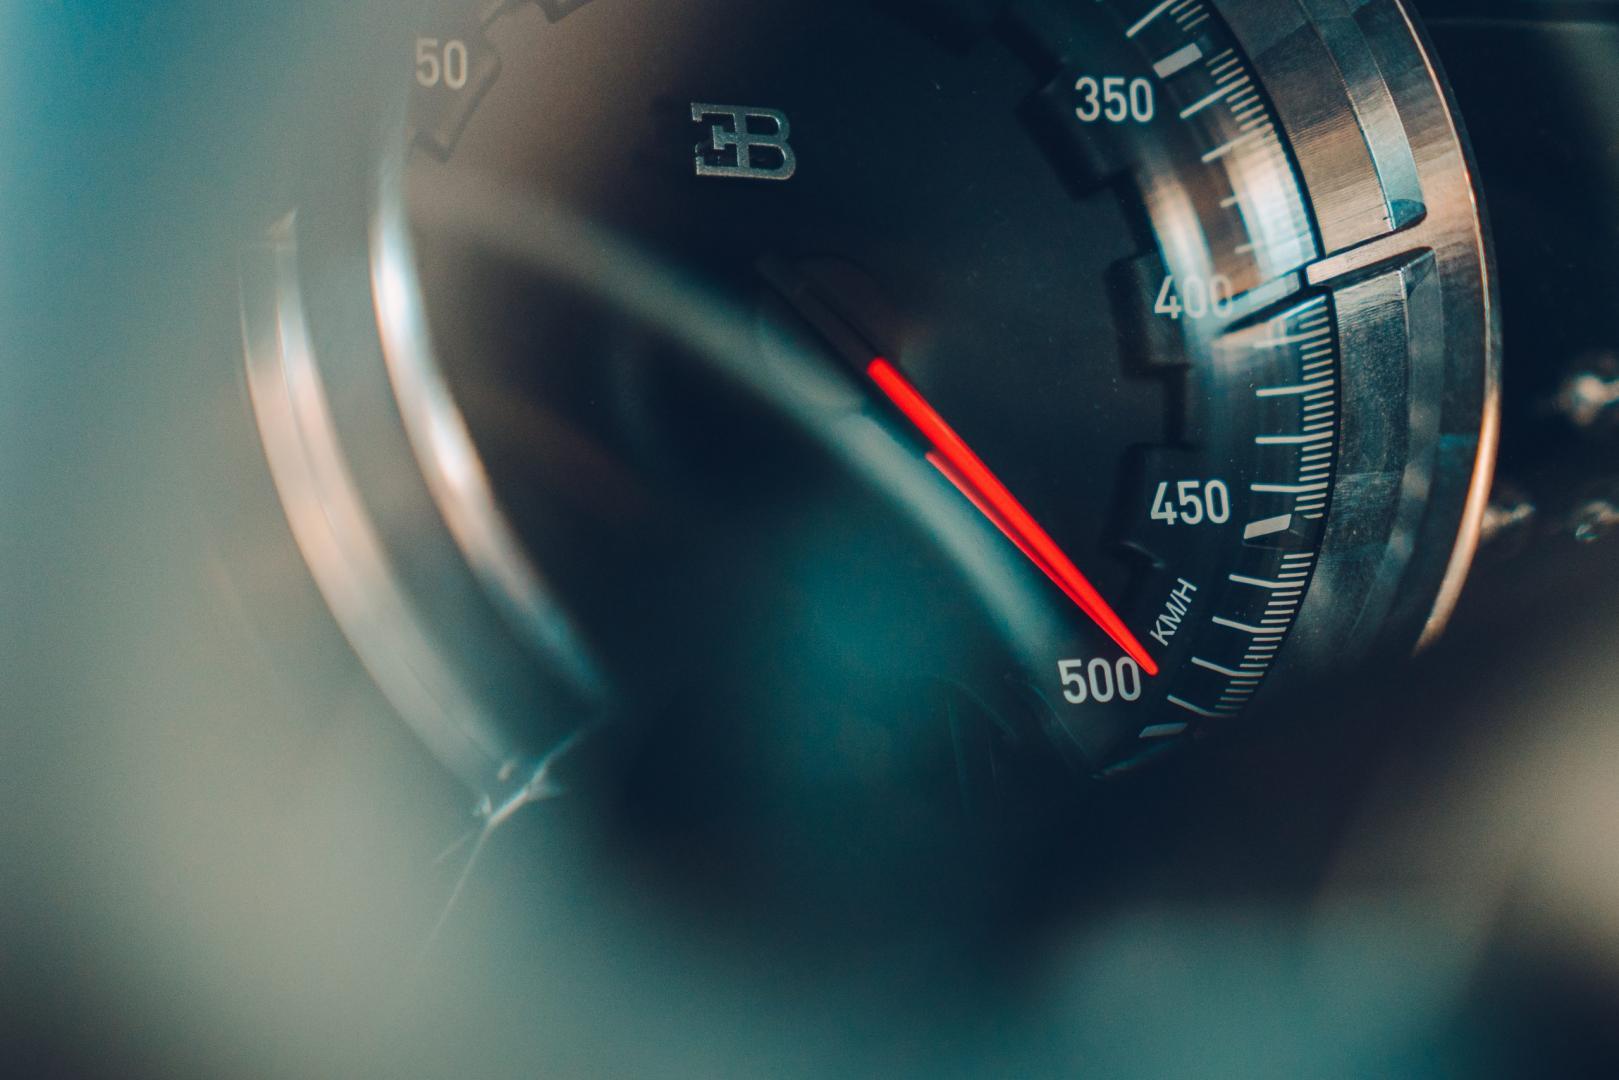 Bugatti Chiron Super Sport interieur meter